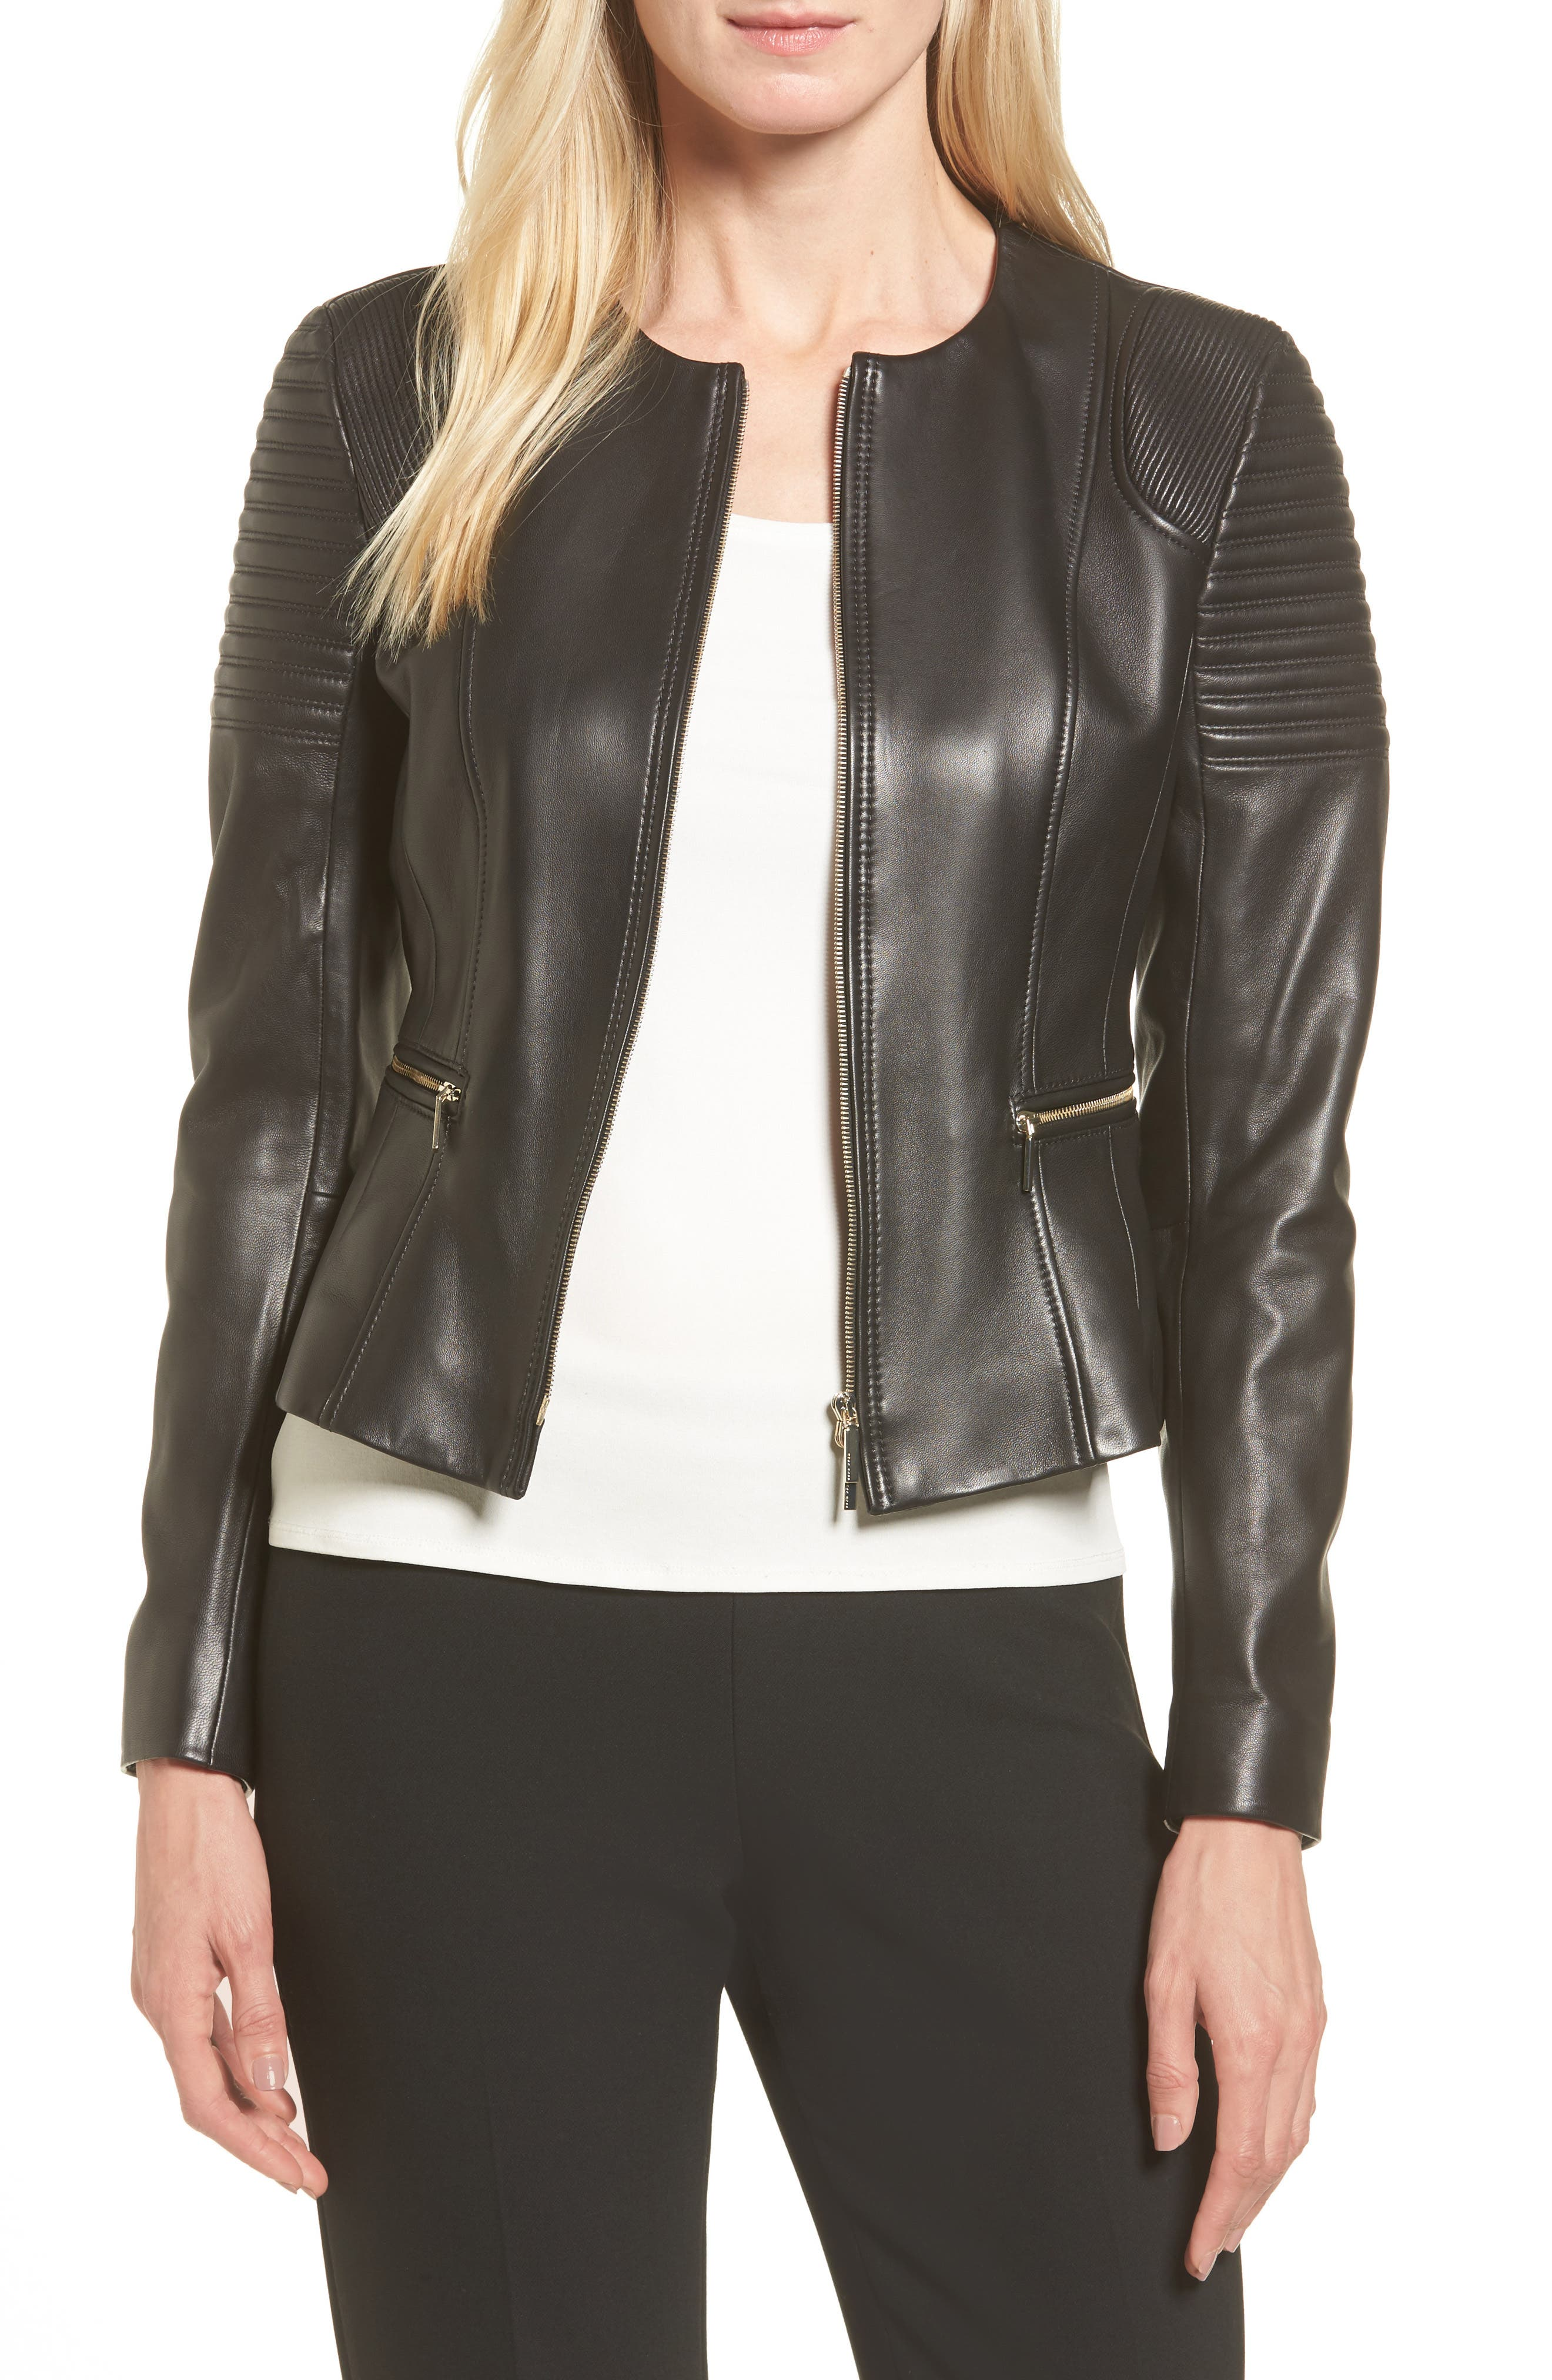 Sakumaya Leather Jacket,                             Main thumbnail 1, color,                             Black